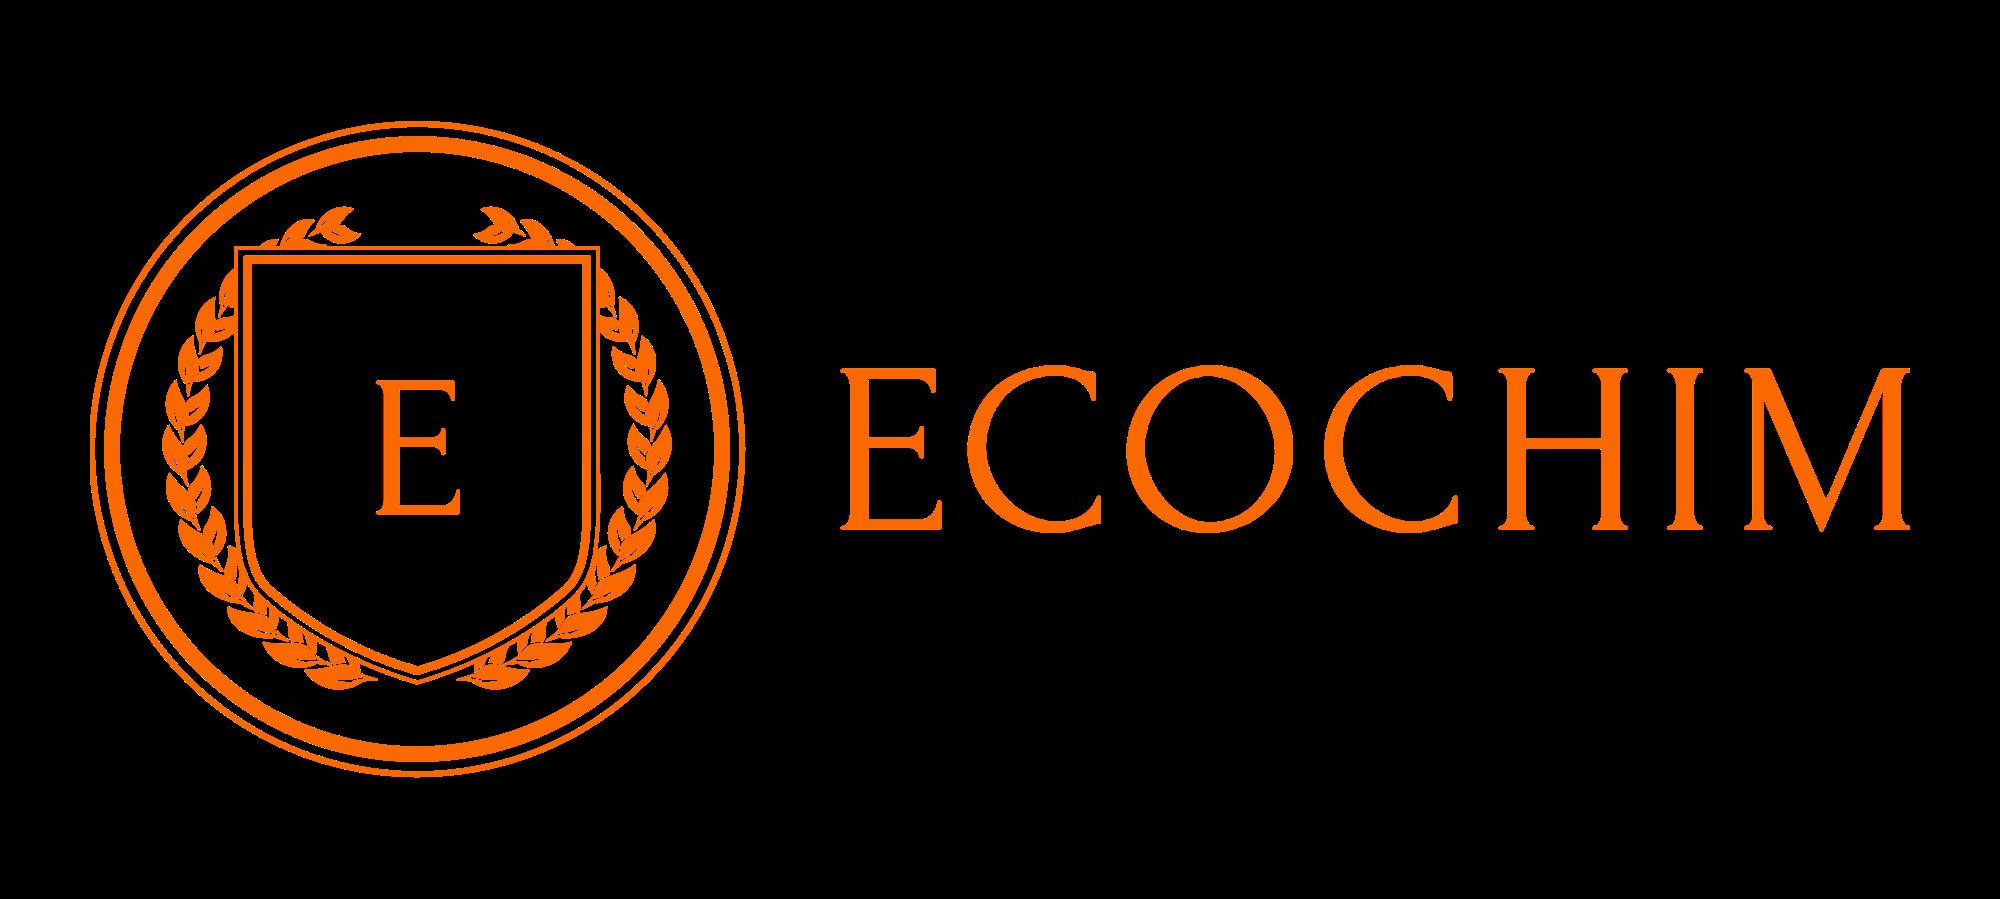 Ecochim-Grup SRL